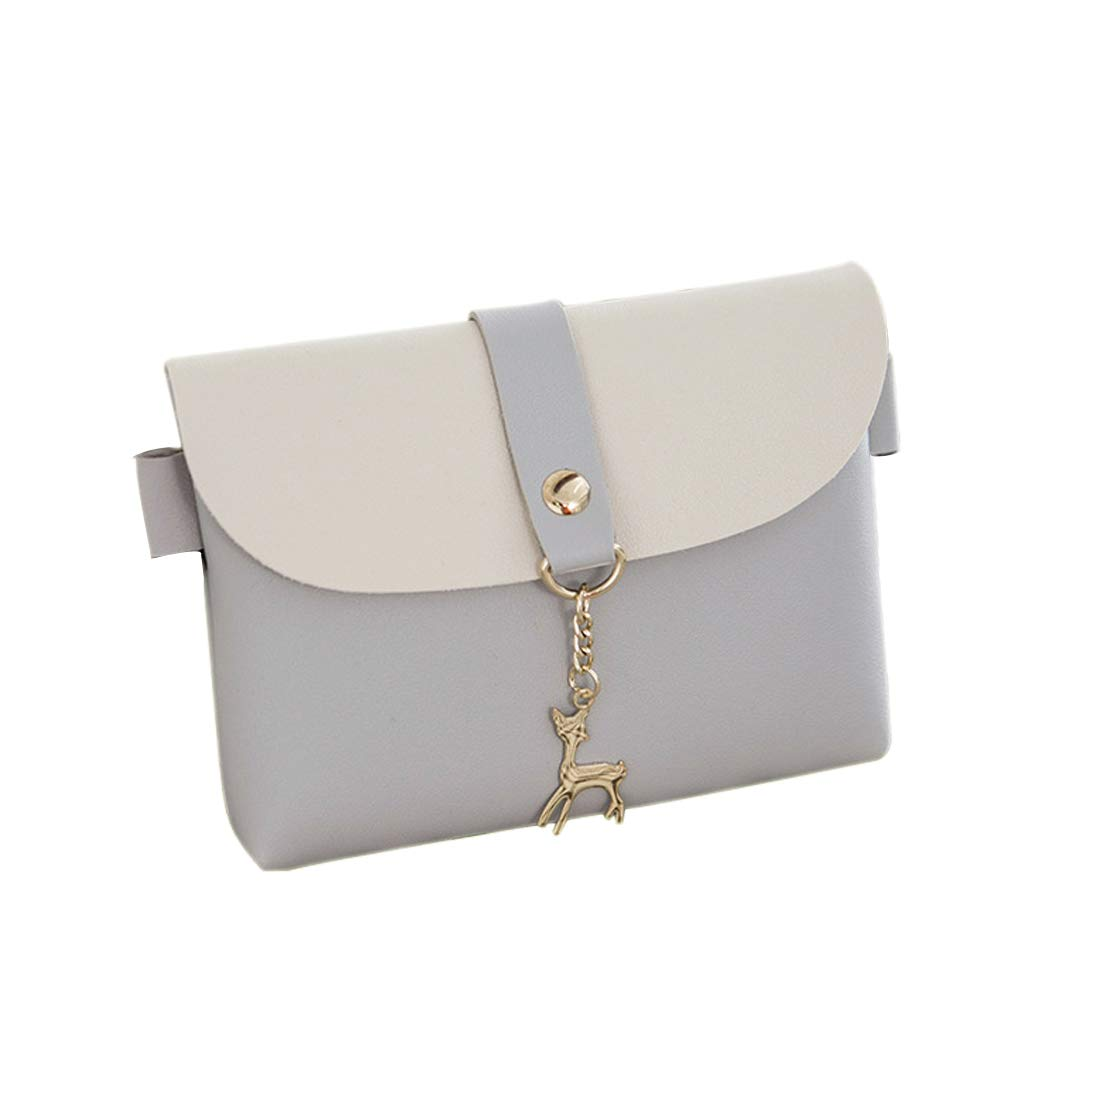 Crossbody Bag PU leather Small Purse Handbag for women,Grey